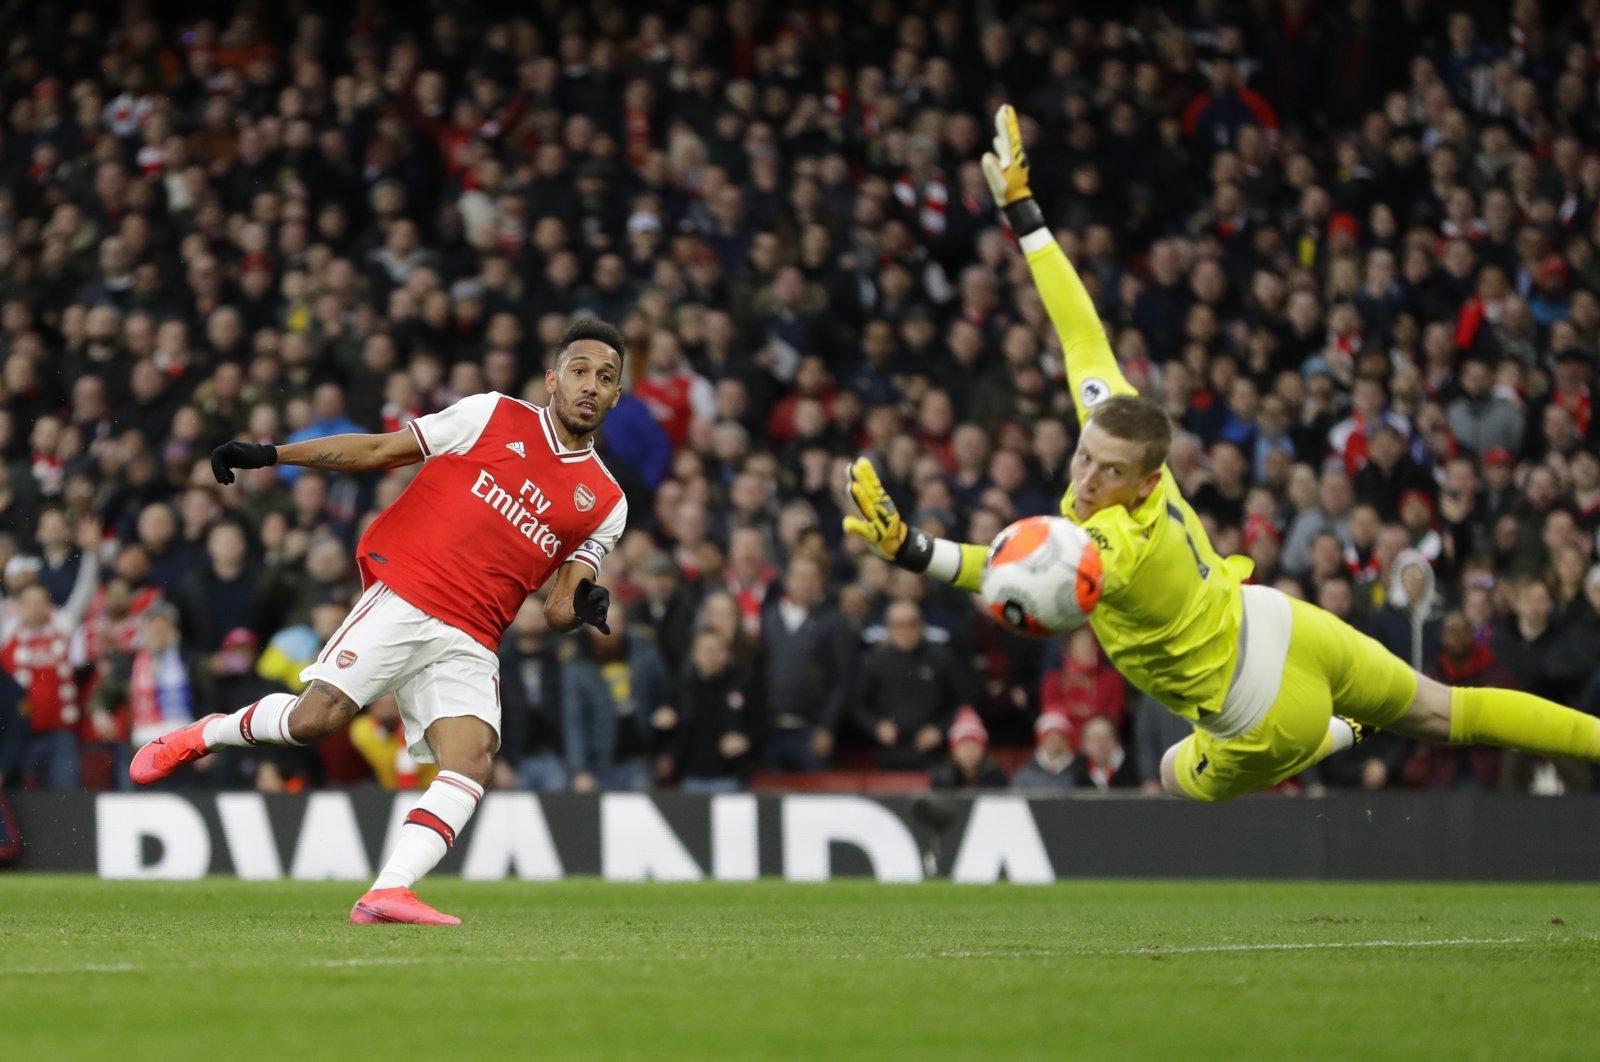 Arsenal's Pierre-Emerick Aubameyang scores a a goal during a Premier League against Everton in London, Feb. 23, 2020. (AP Photo)